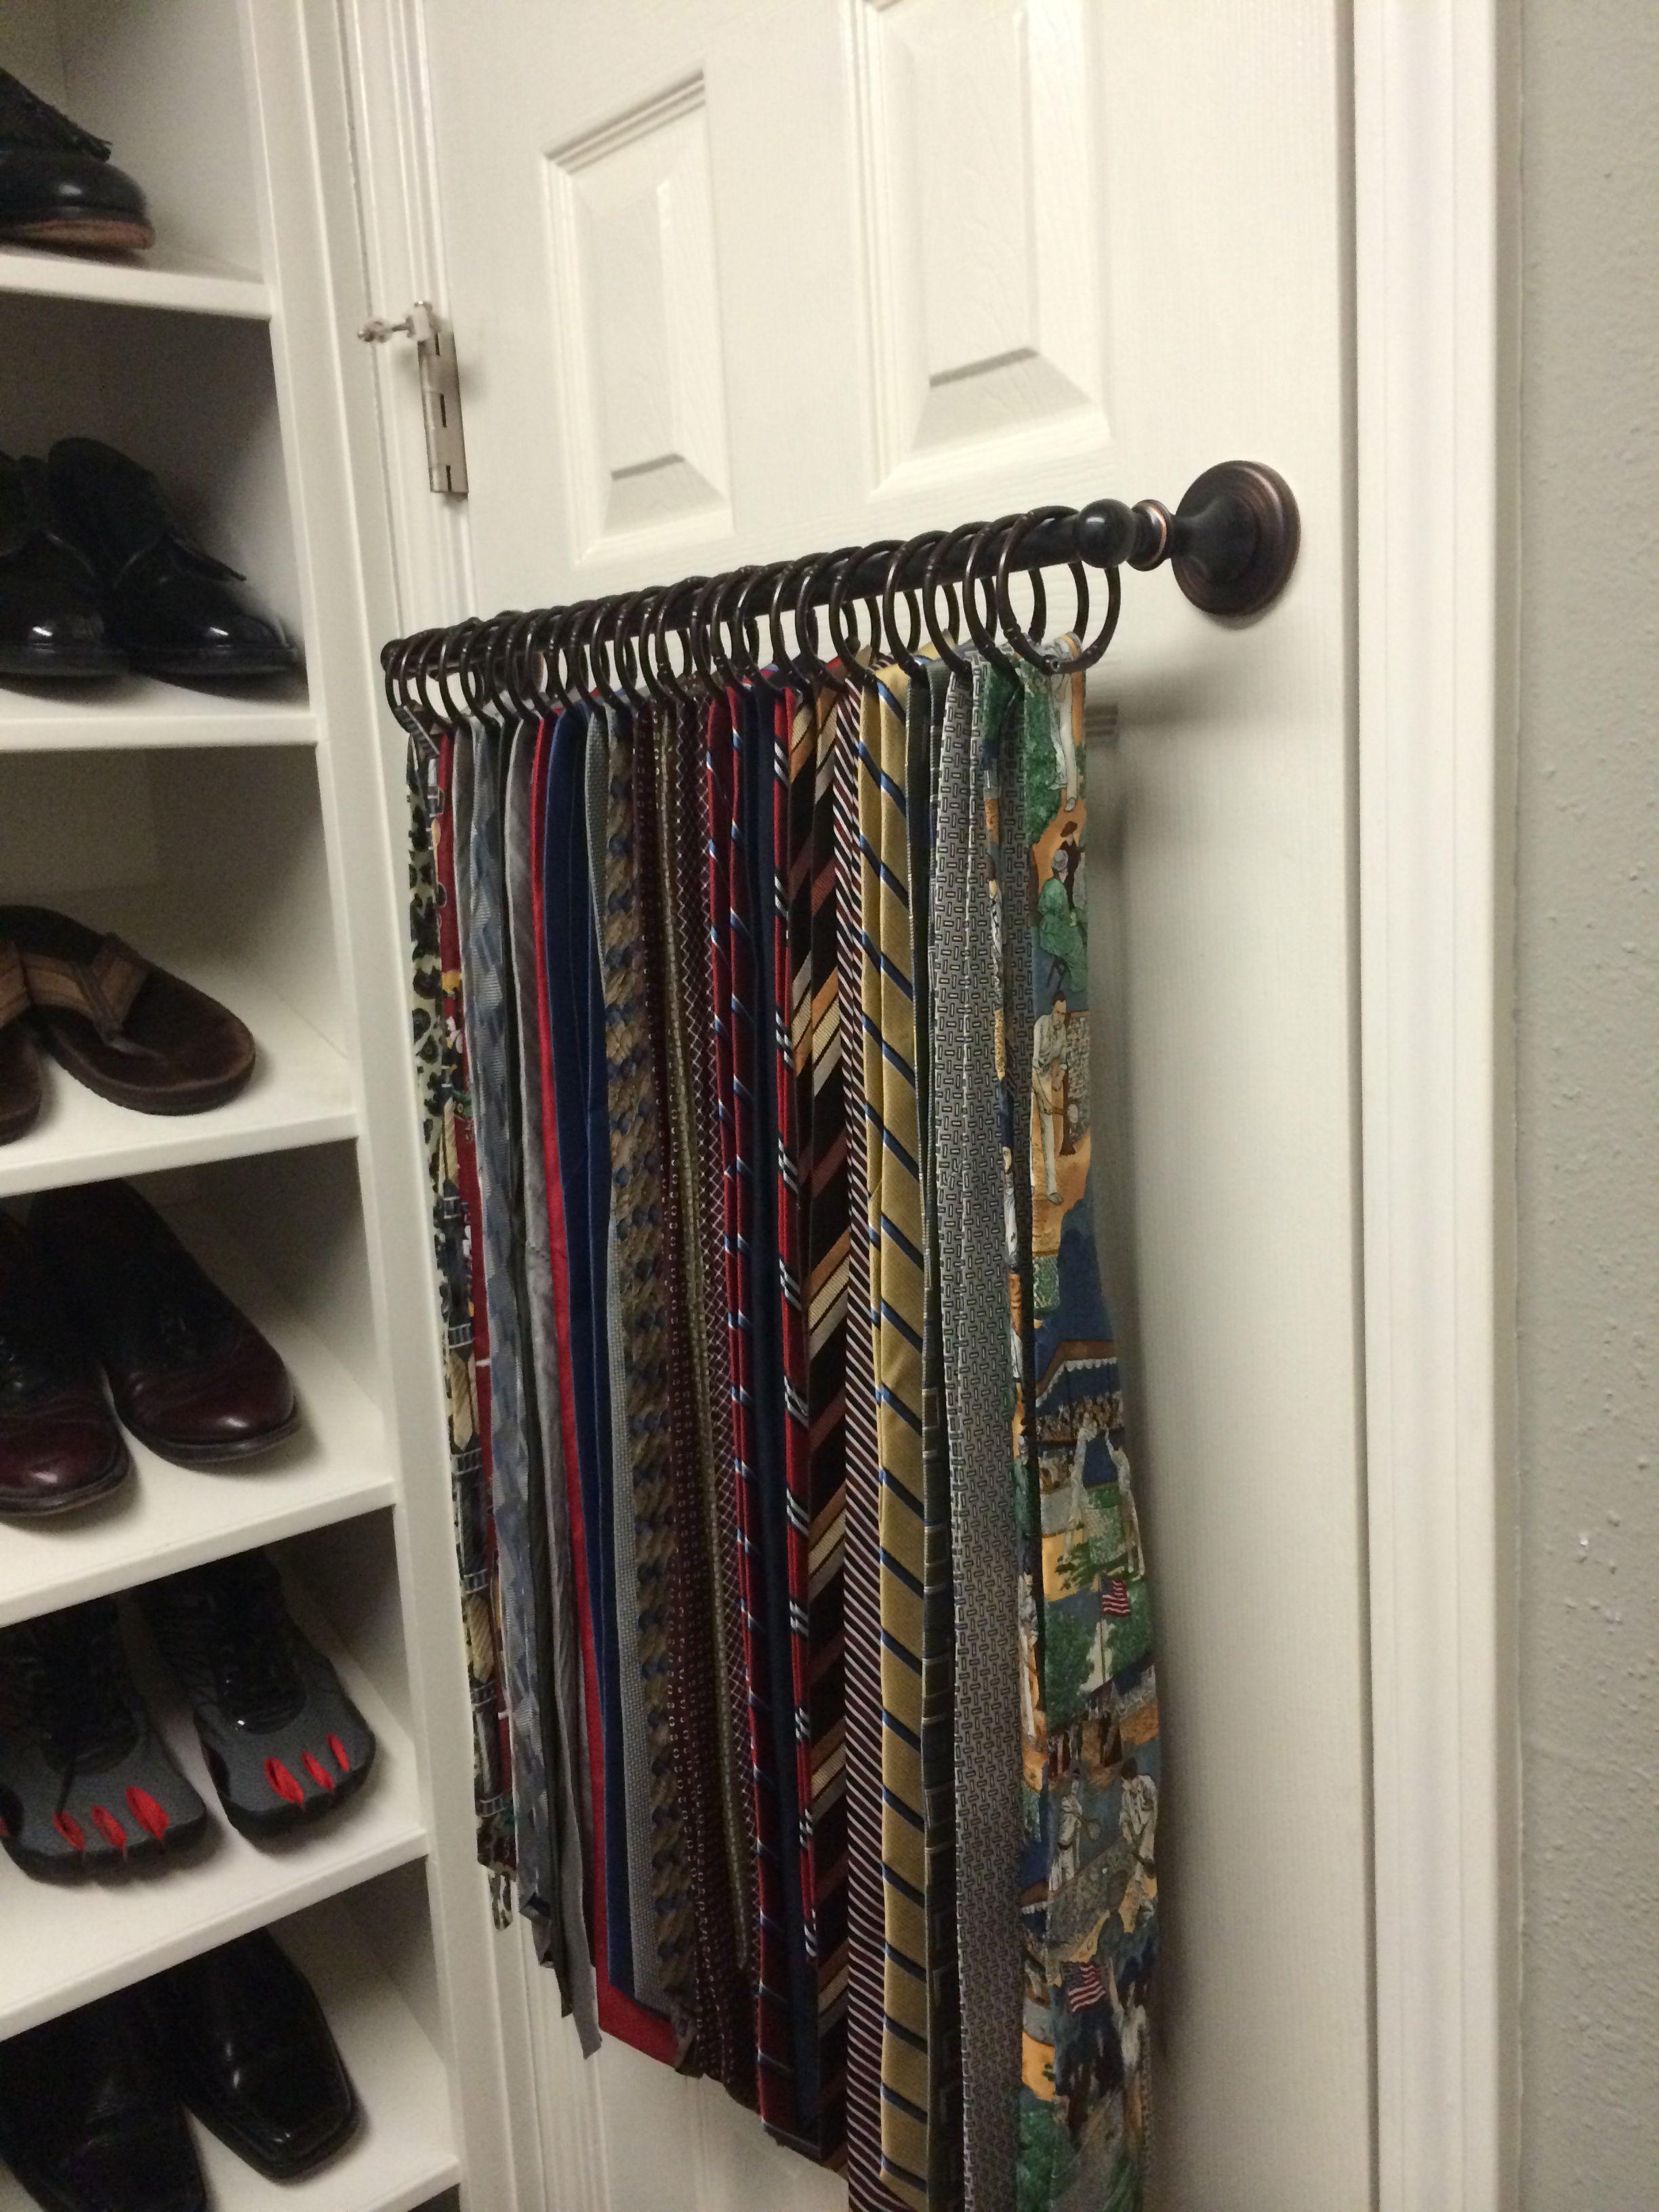 Tie holder - great idea for belts, scarves, etc. DPOWXEQ